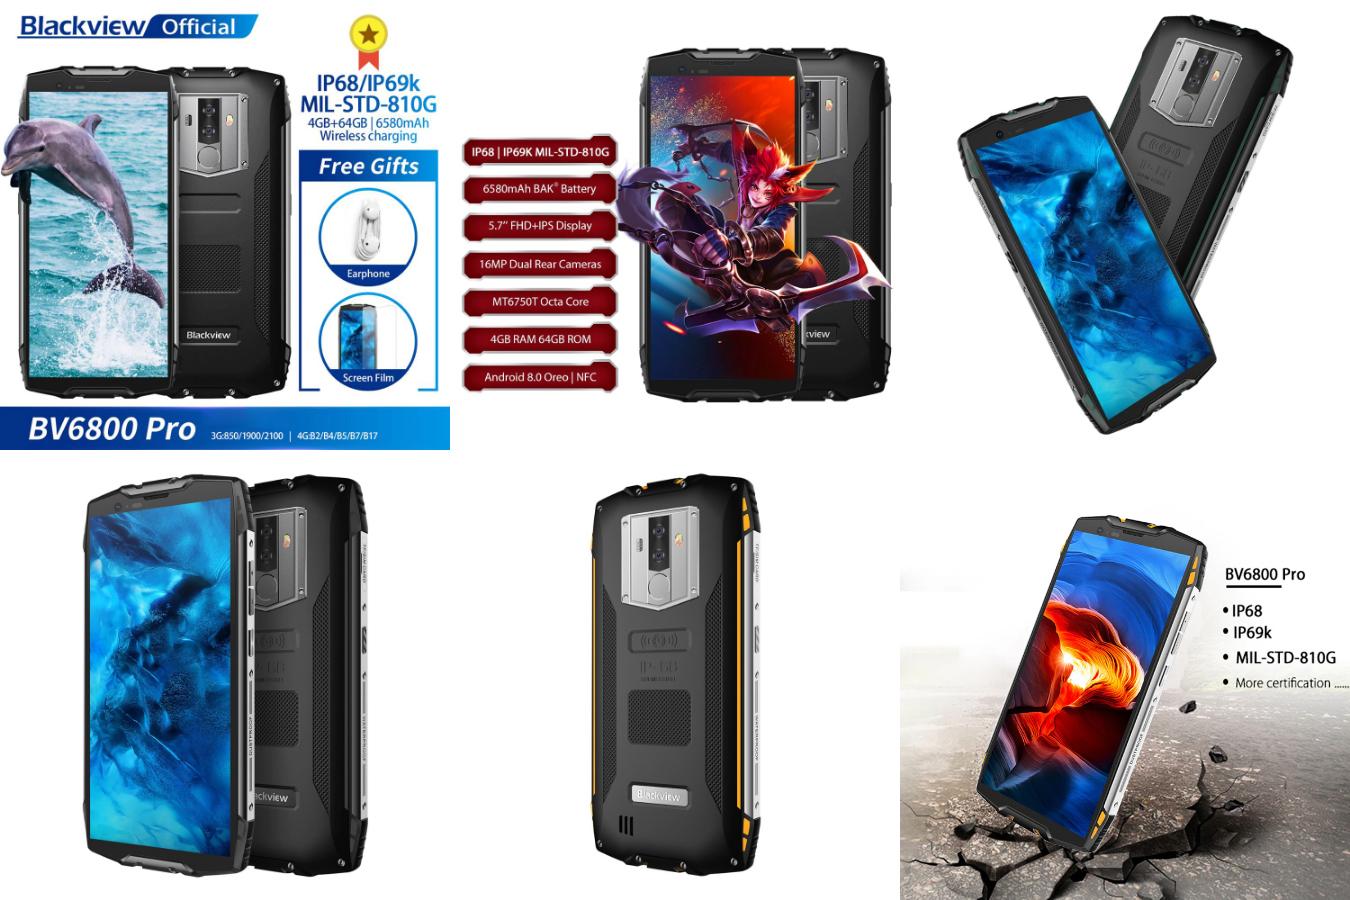 Брутальный смартфон Blackview BV6800 Pro